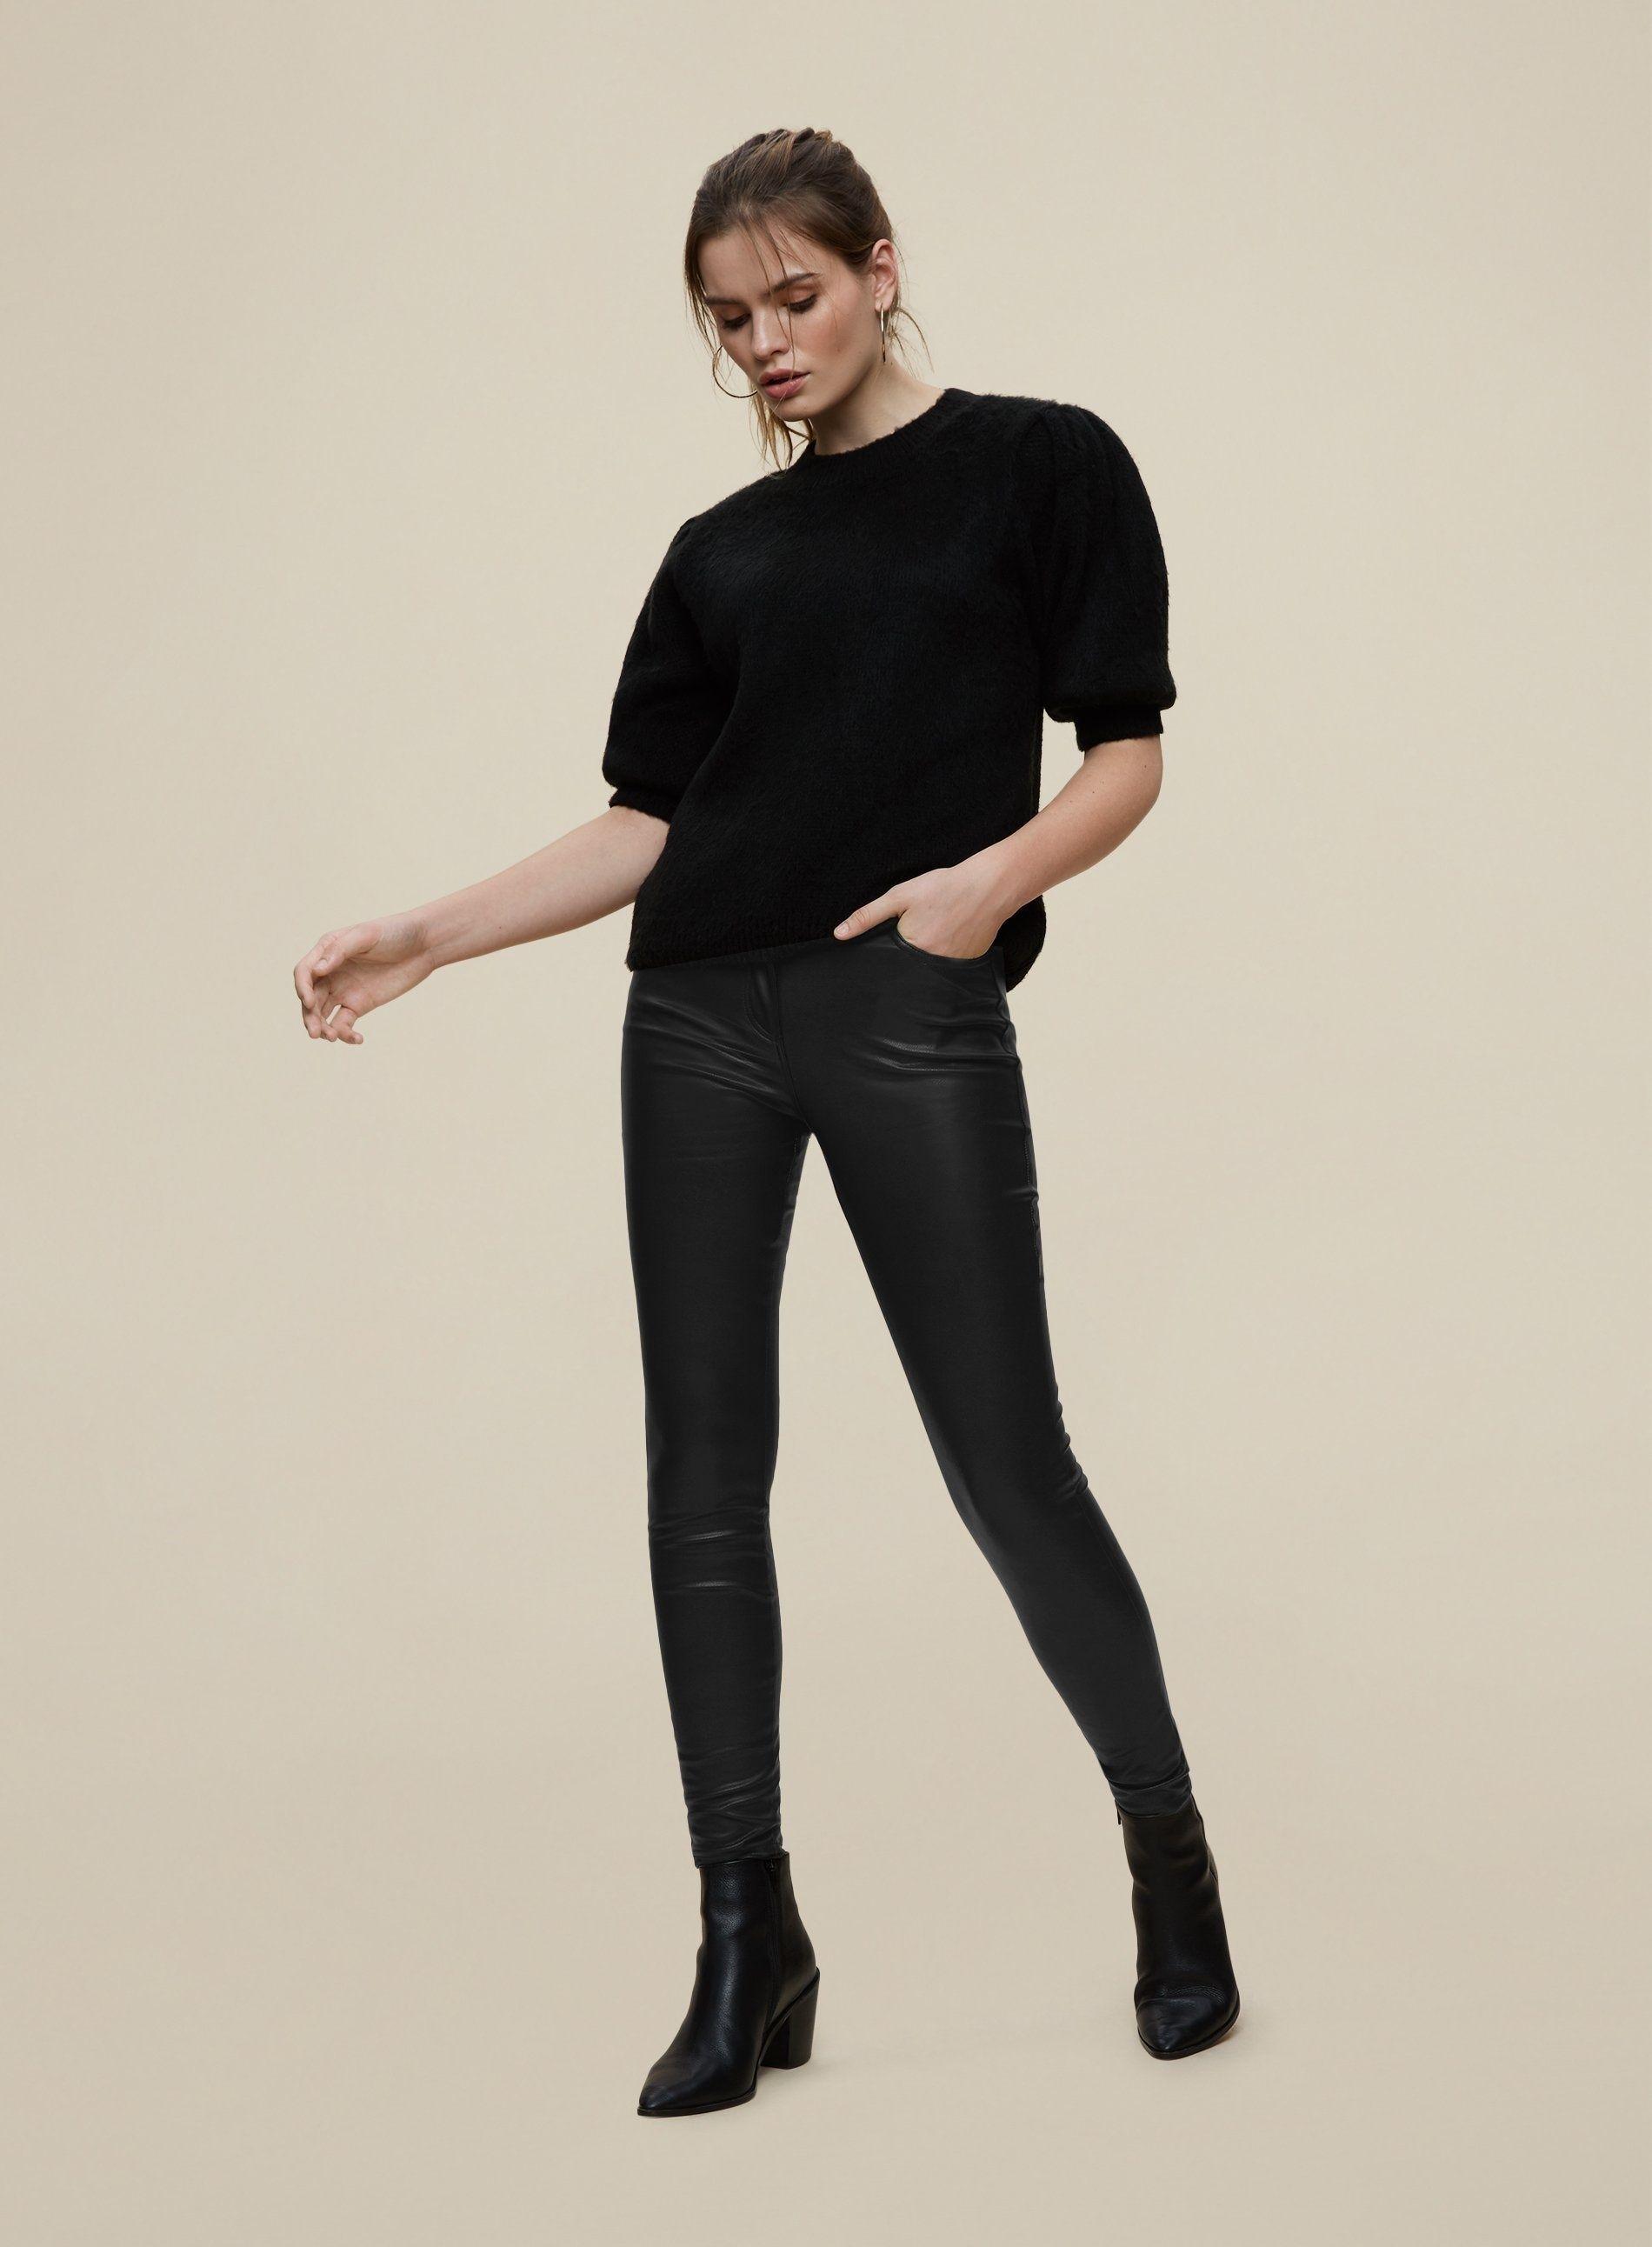 Dorothy Perkins Womens Black Polyurethane Jeans Denim Pants Bottoms Trousers